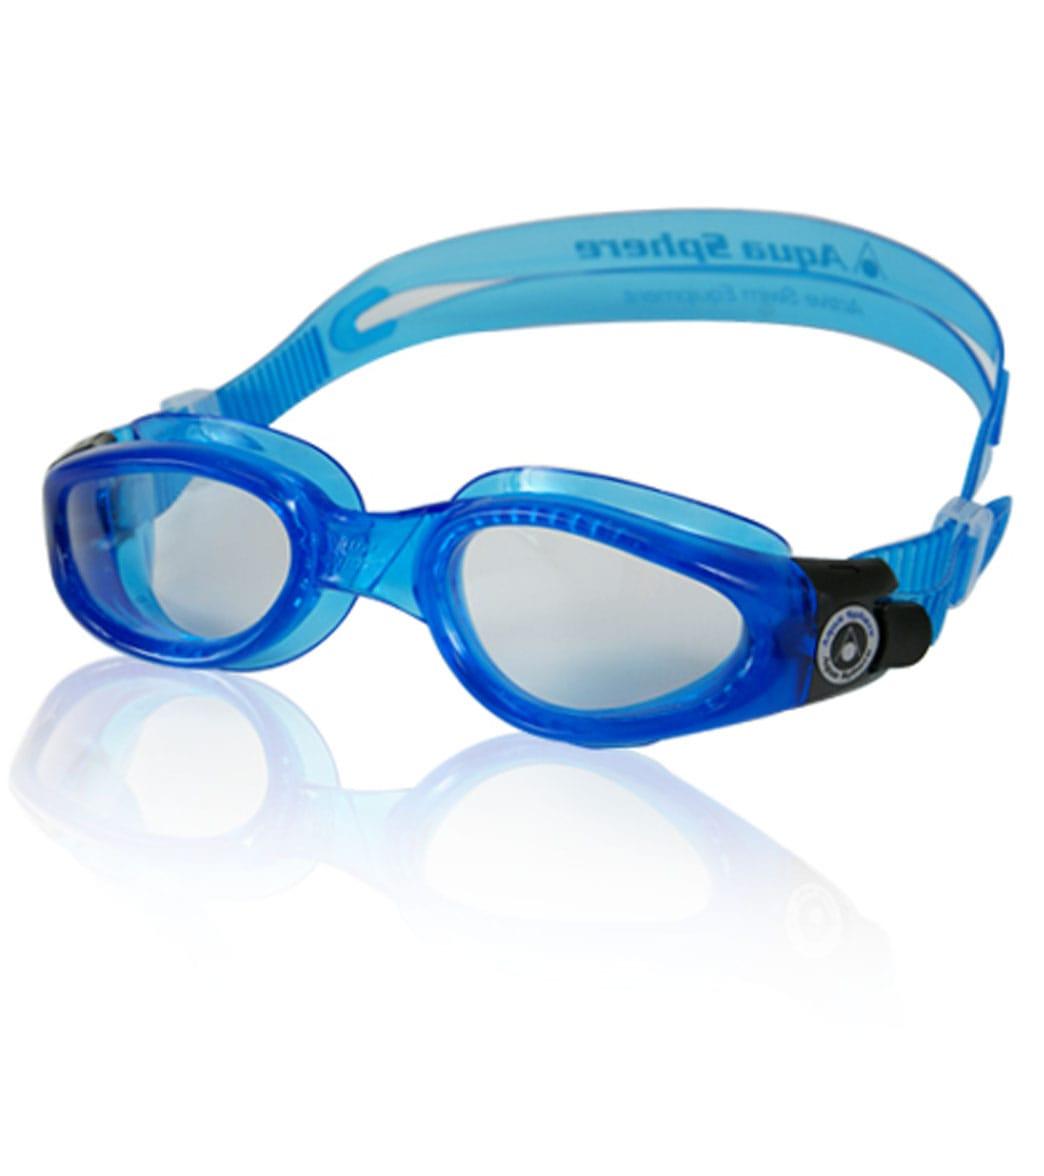 e875e723170cf Aqua Sphere Kaiman Goggle Clear Lens at SwimOutlet.com